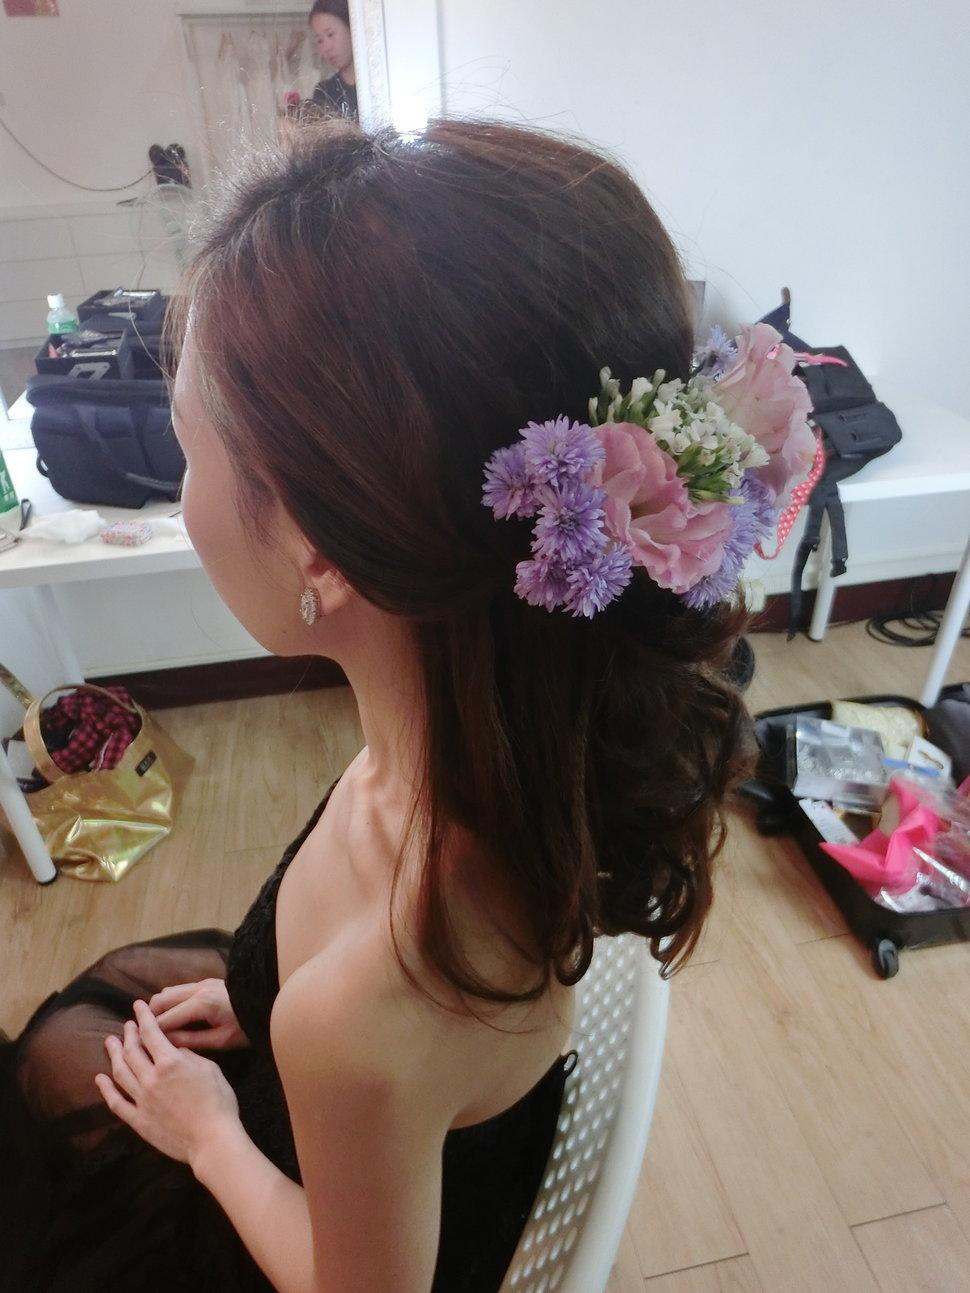 F0602425-1CDE-446A-A481-99A73AEEFA90 - Beauty愛美麗·整體造型 - 結婚吧